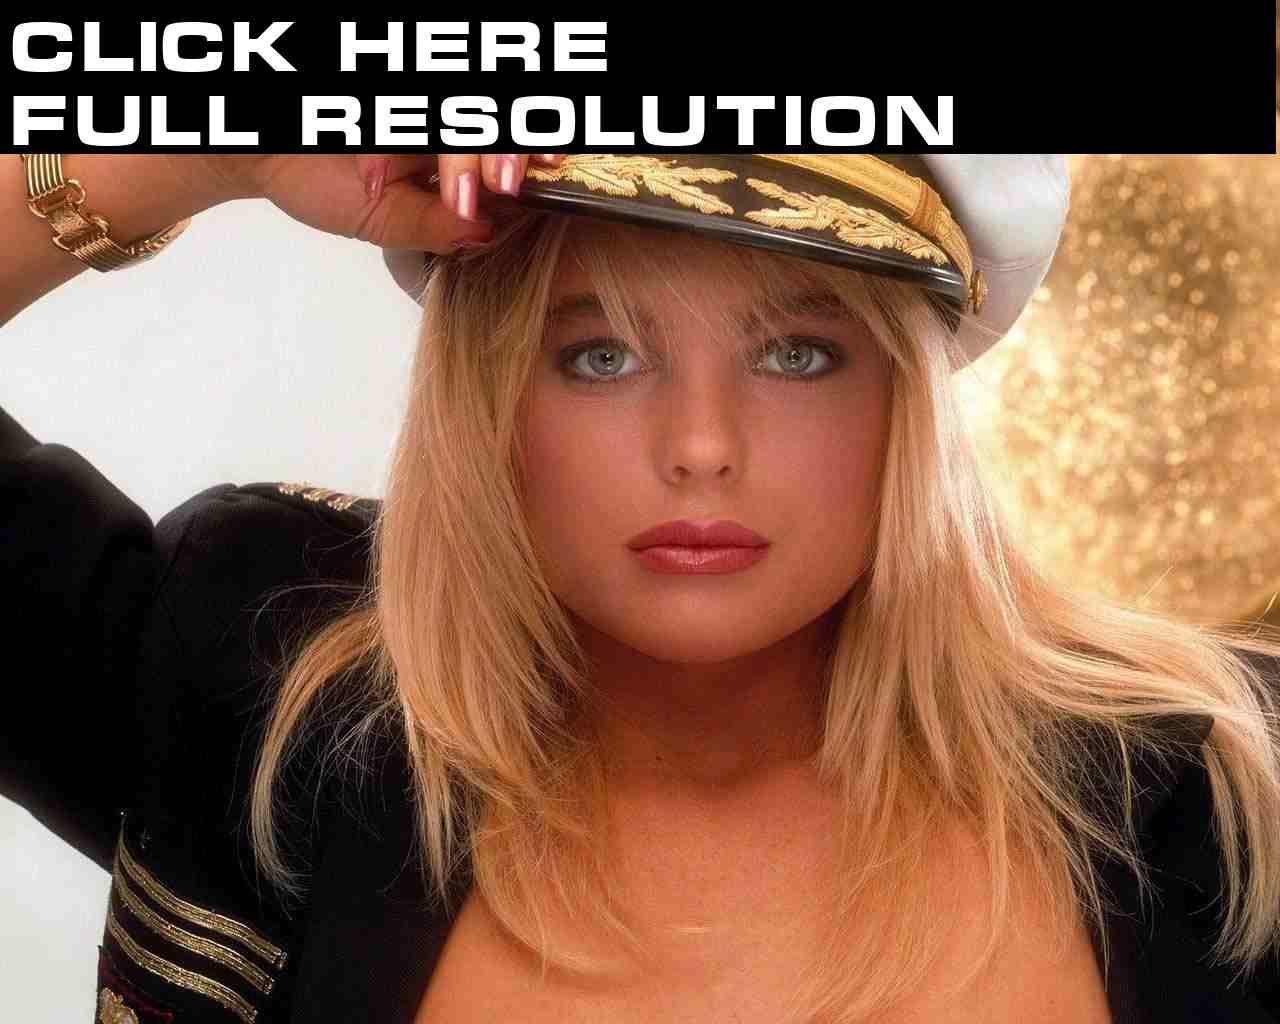 Watch Erika Eleniak born September 29, 1969 (age 49) video